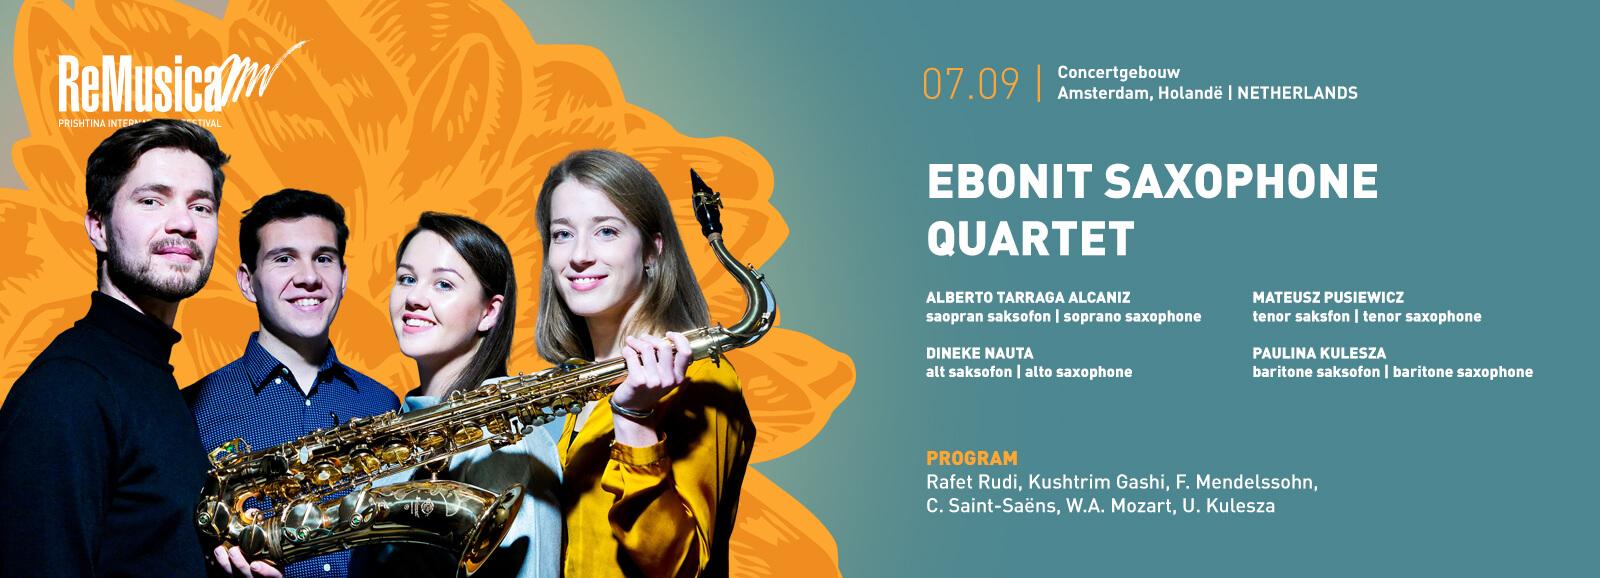 Edonit Saxophone Quartet